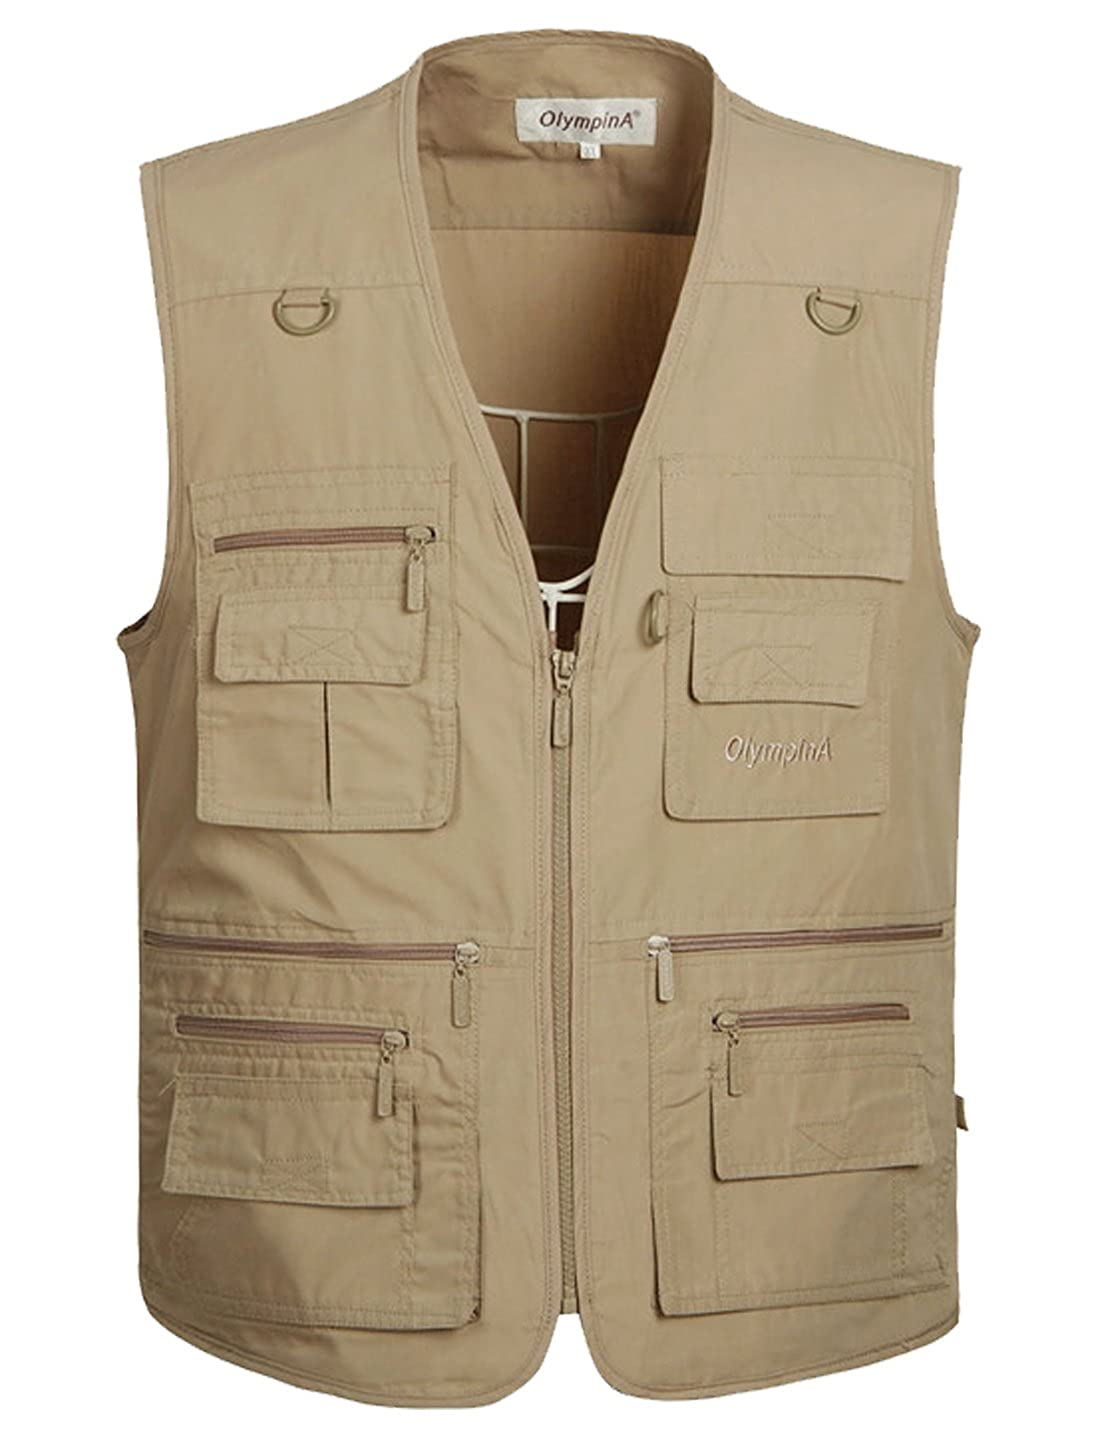 Jofemuho Men Long Sleeve Utility Button Up Cotton Pockets Shirt